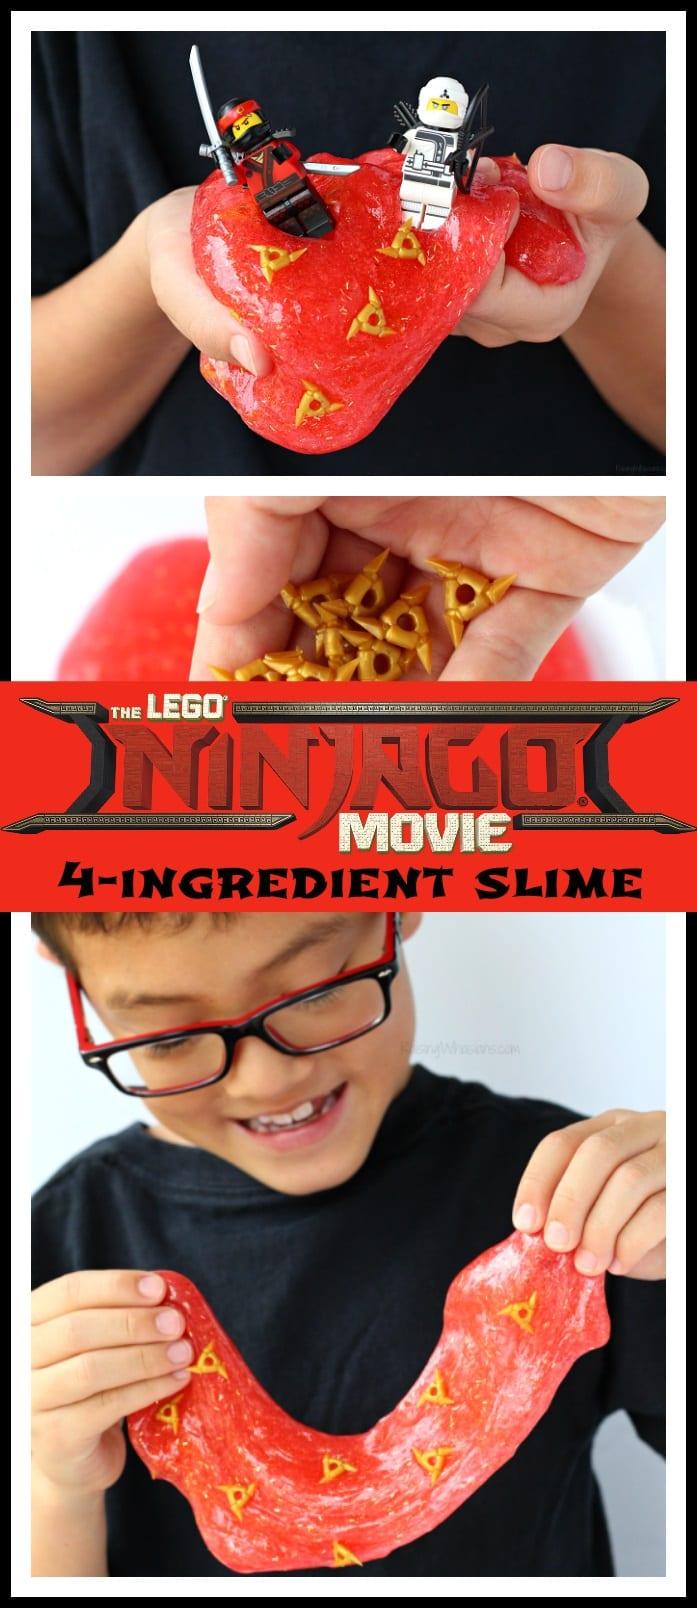 Lego ninjago movie slime